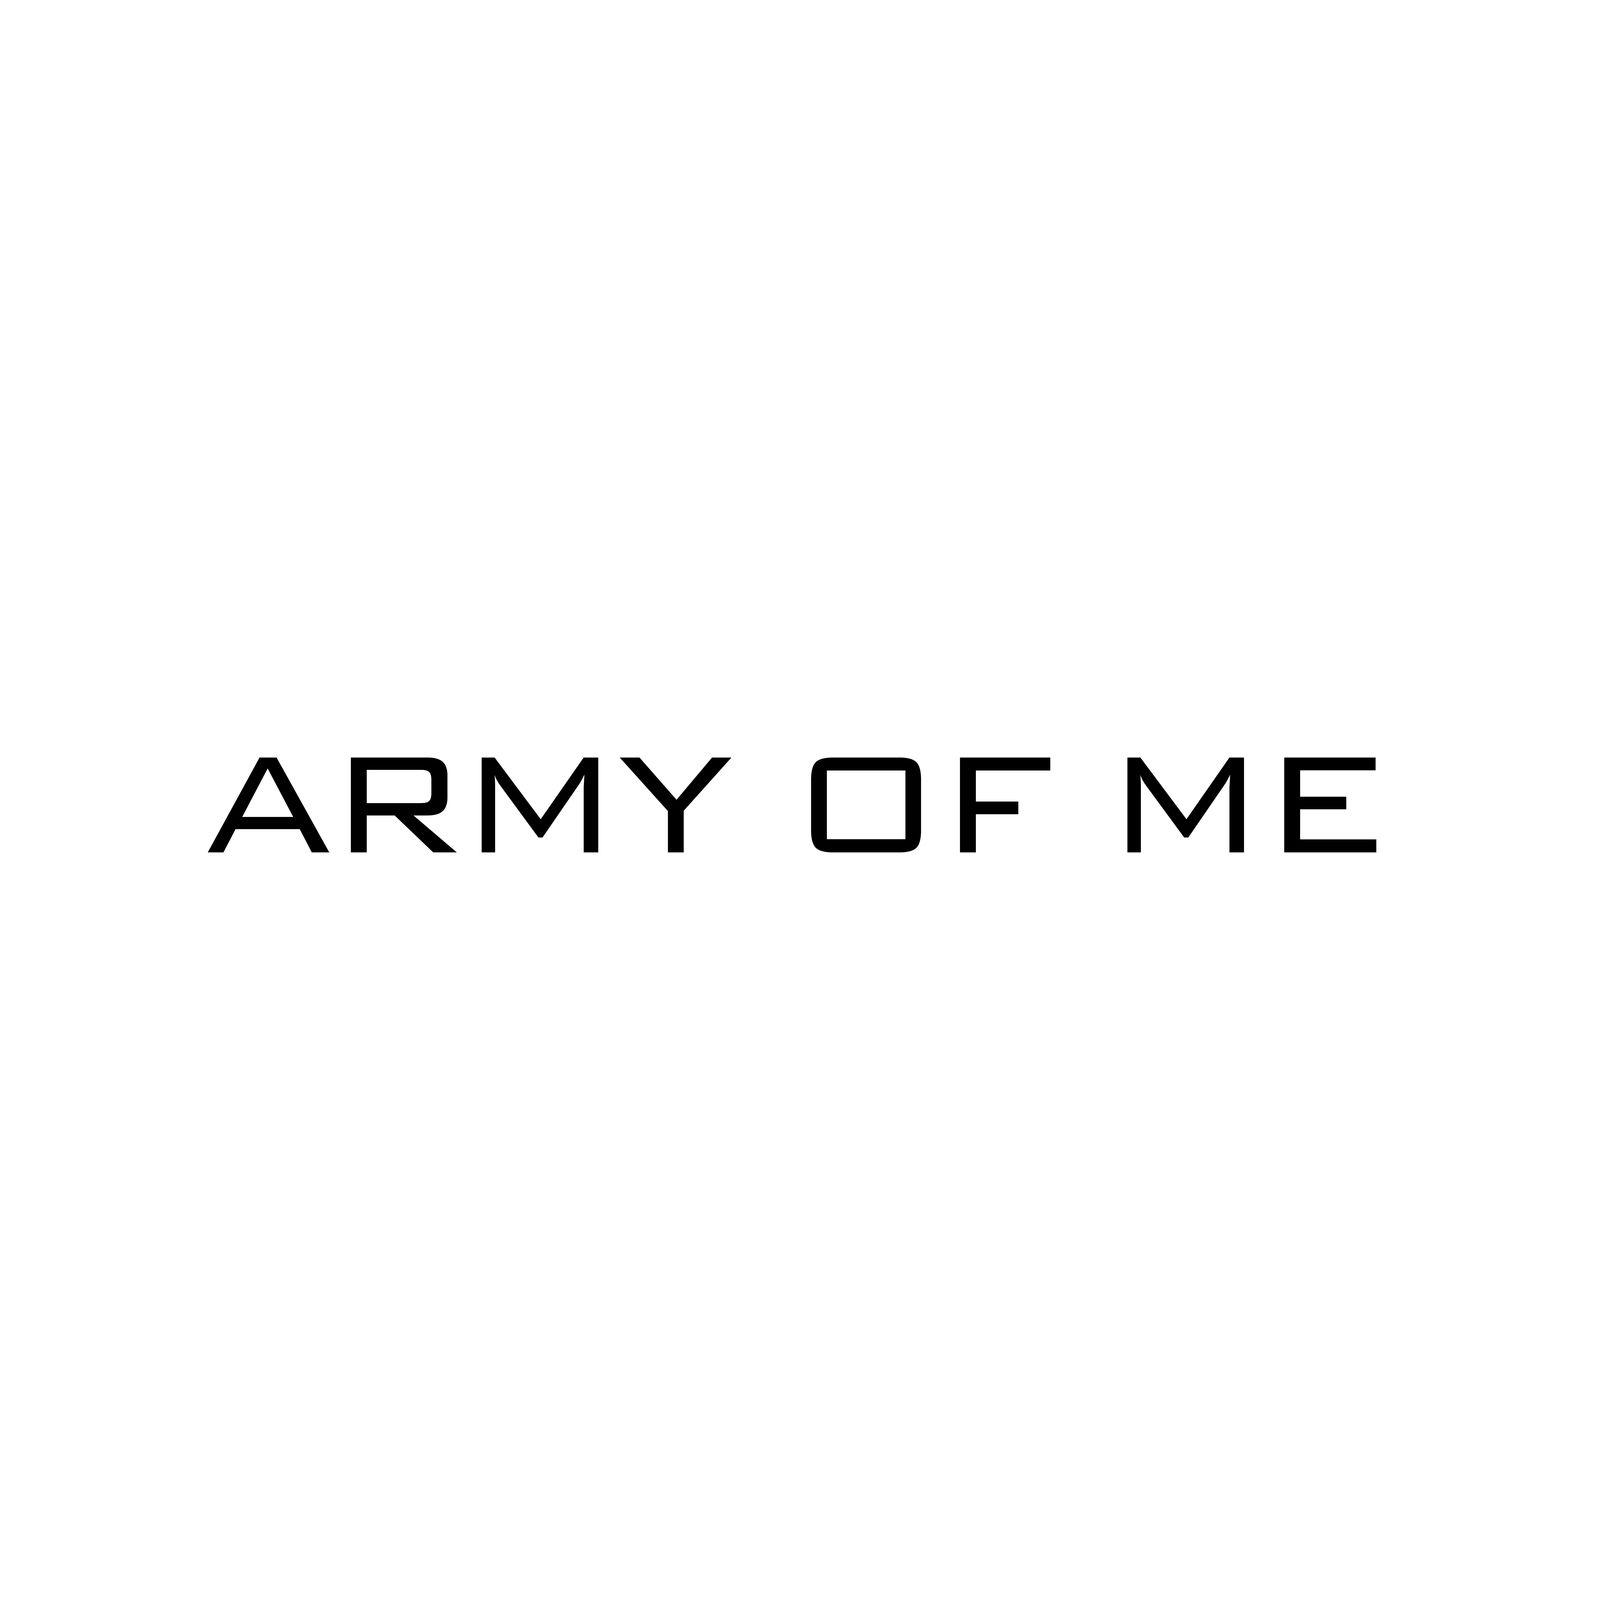 ARMY OF ME (Bild 1)